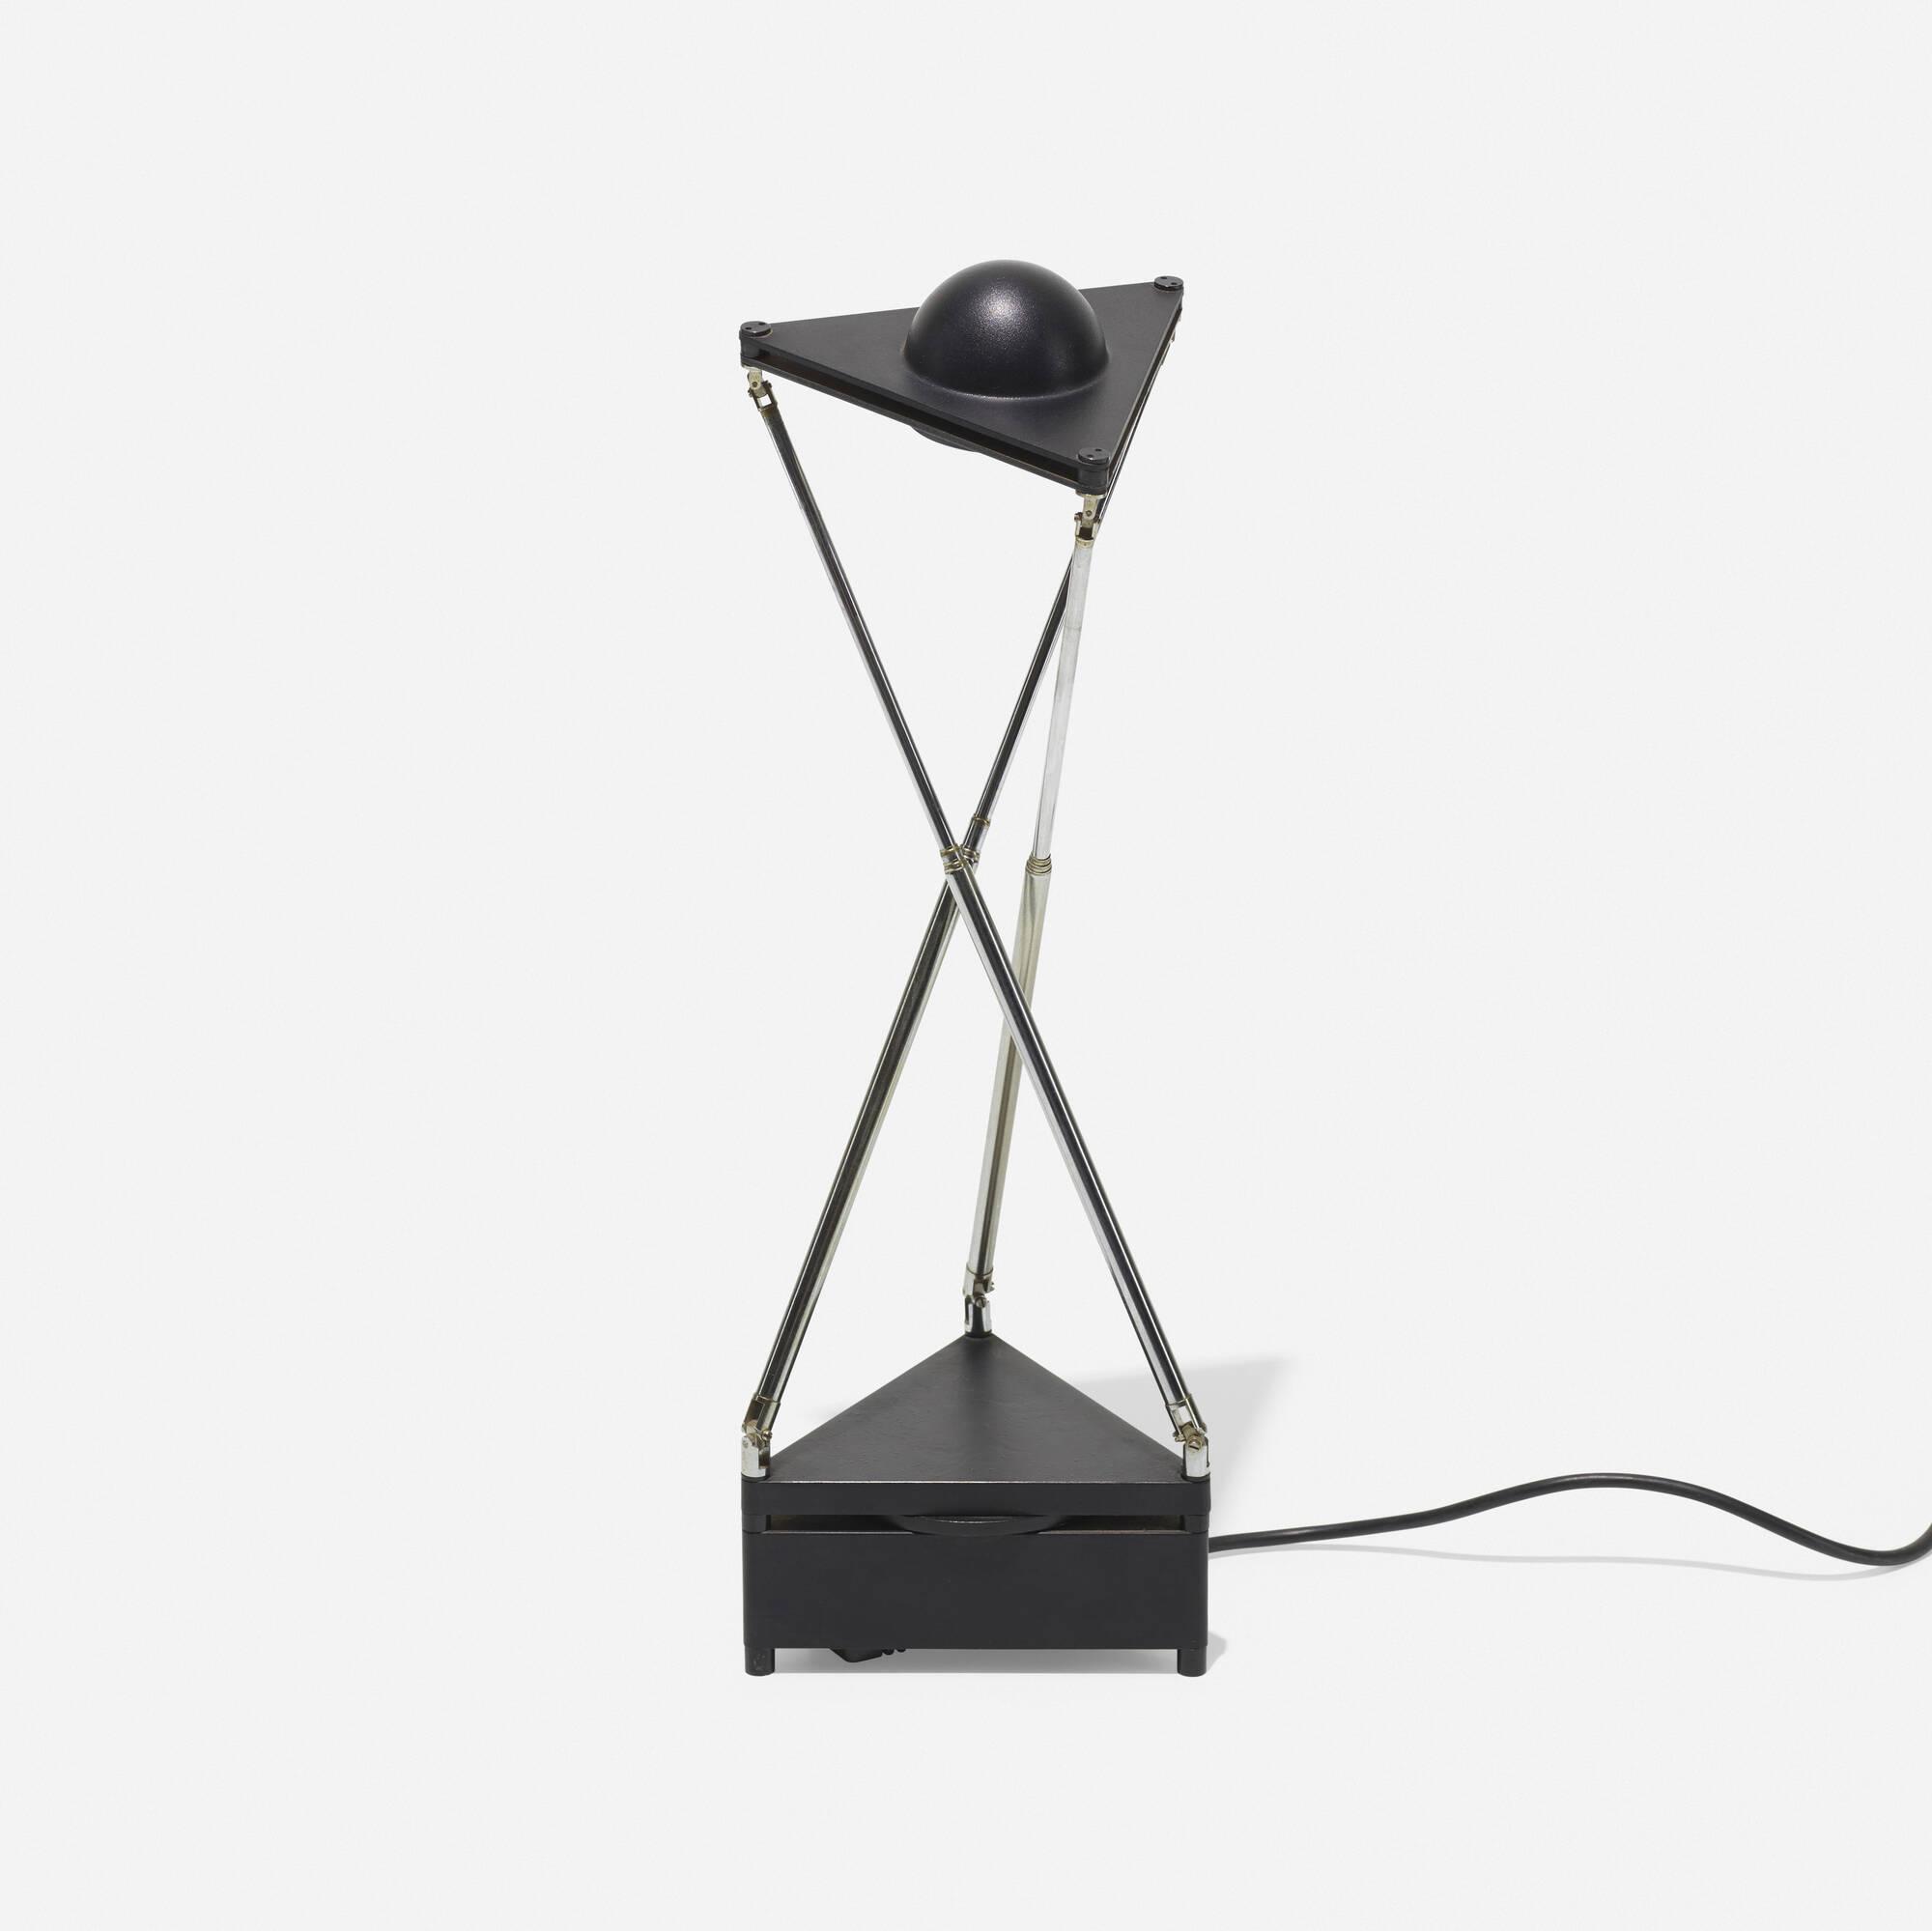 347: Porsche Design Studio / Kandido table lamp (1 of 2)